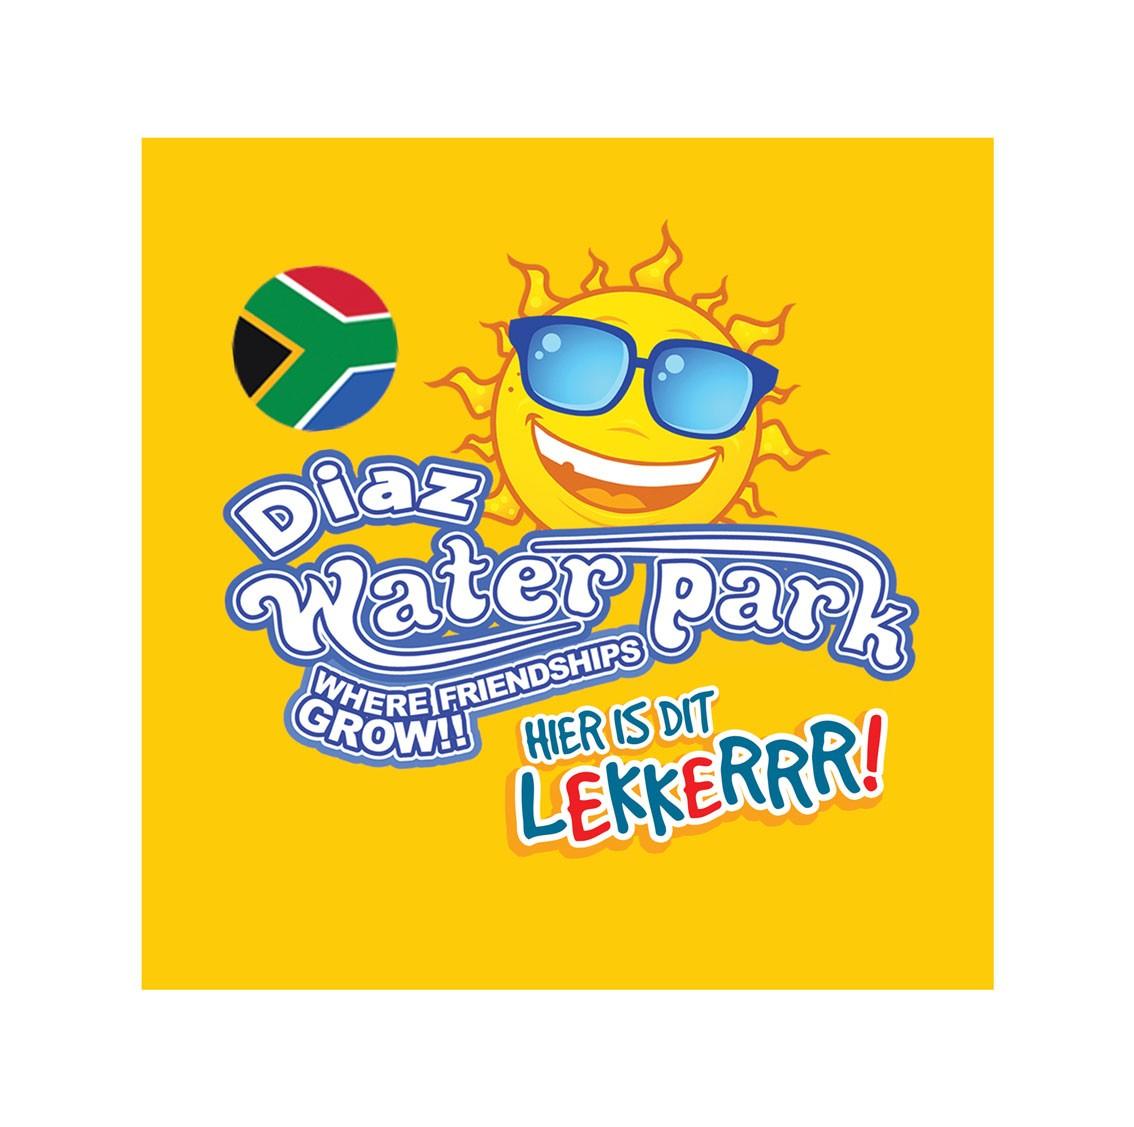 Diaz Water Park logo by Redefine Creative